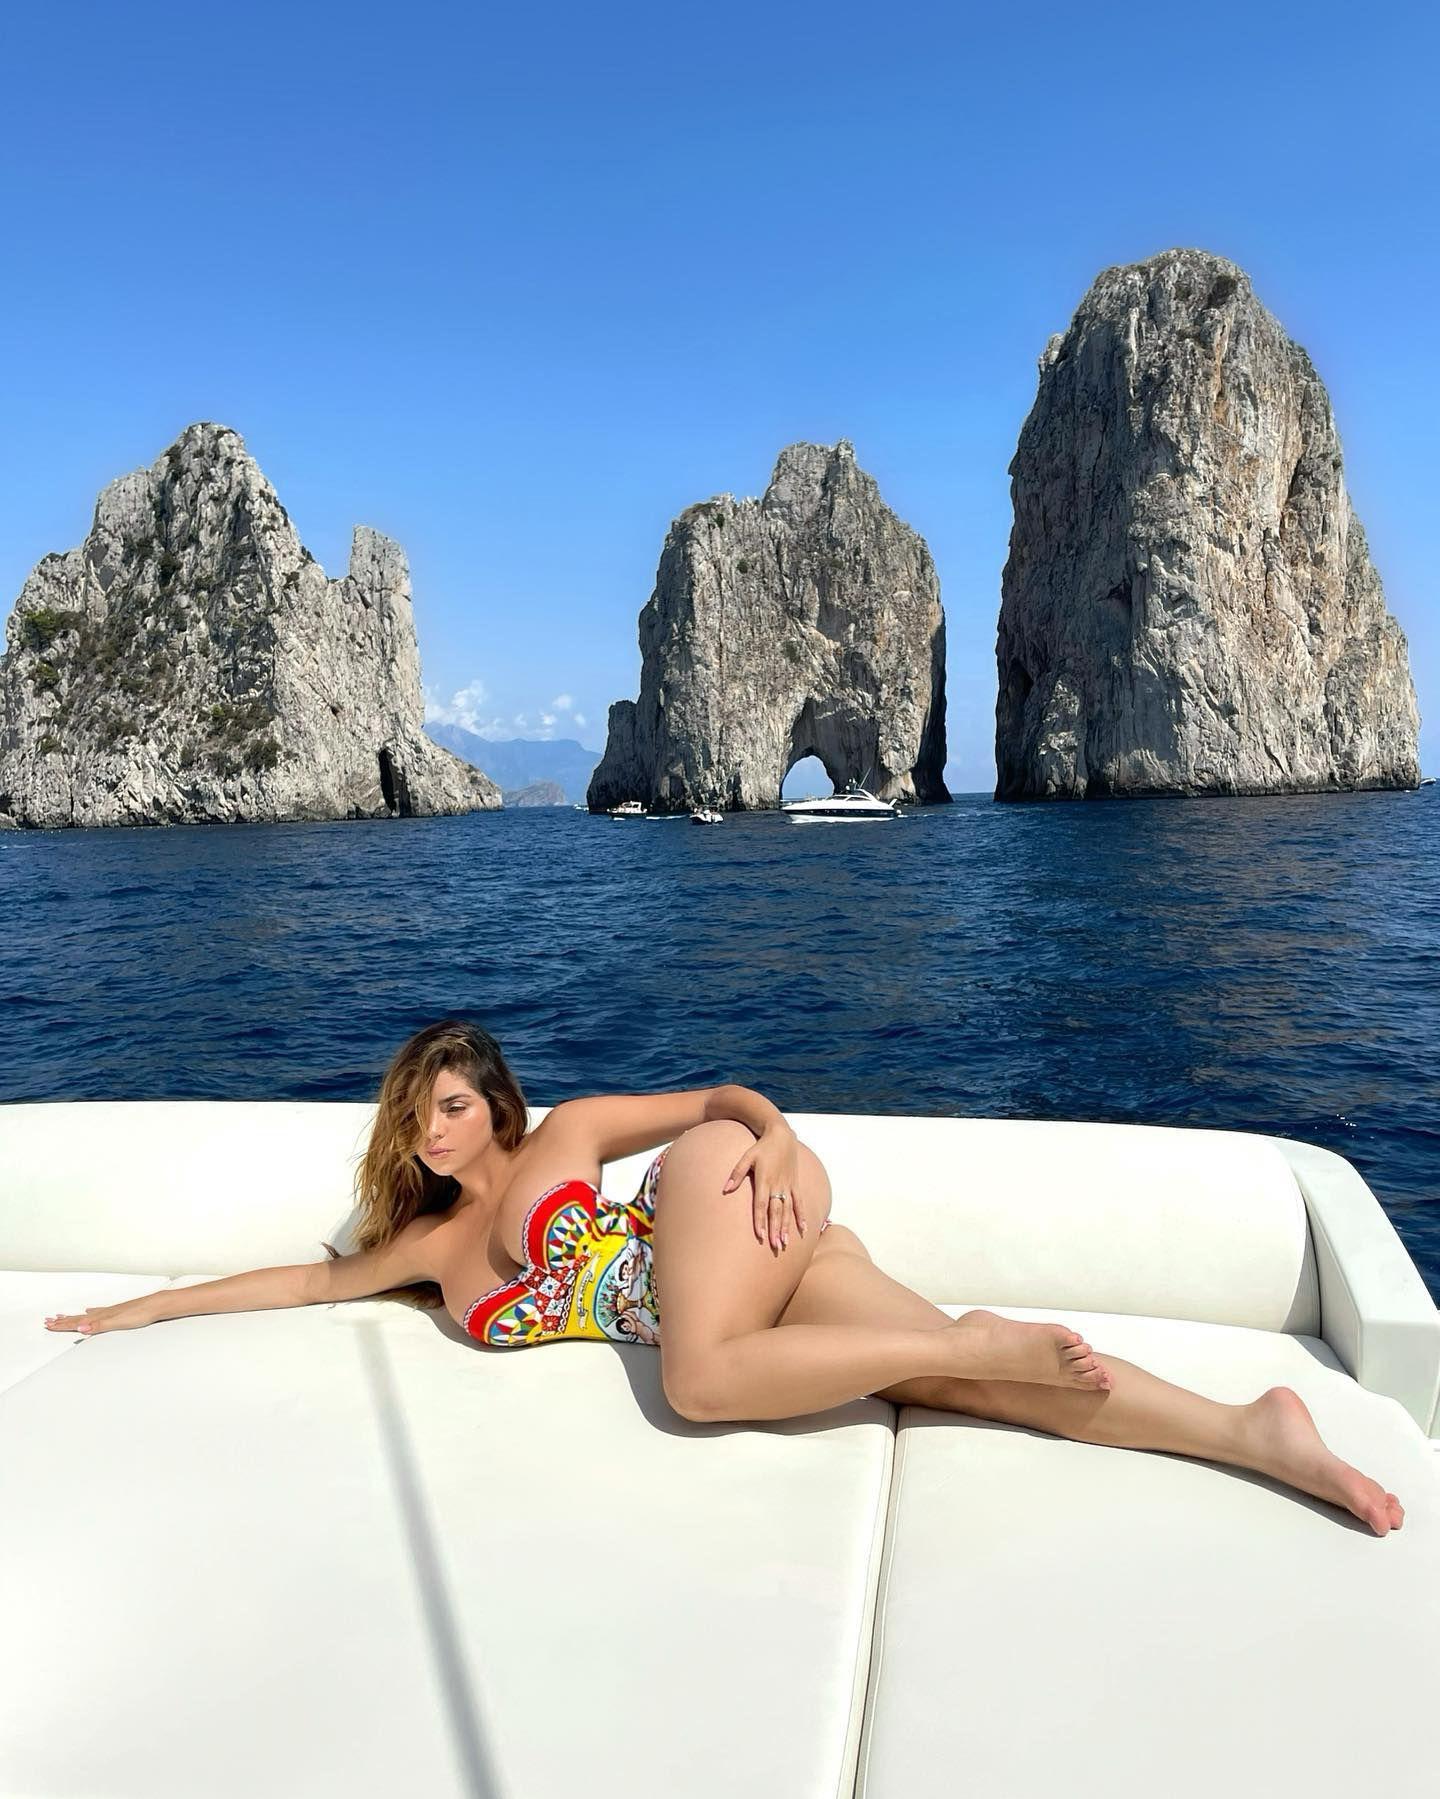 Demi Rose Mawby Huge Nude Ass